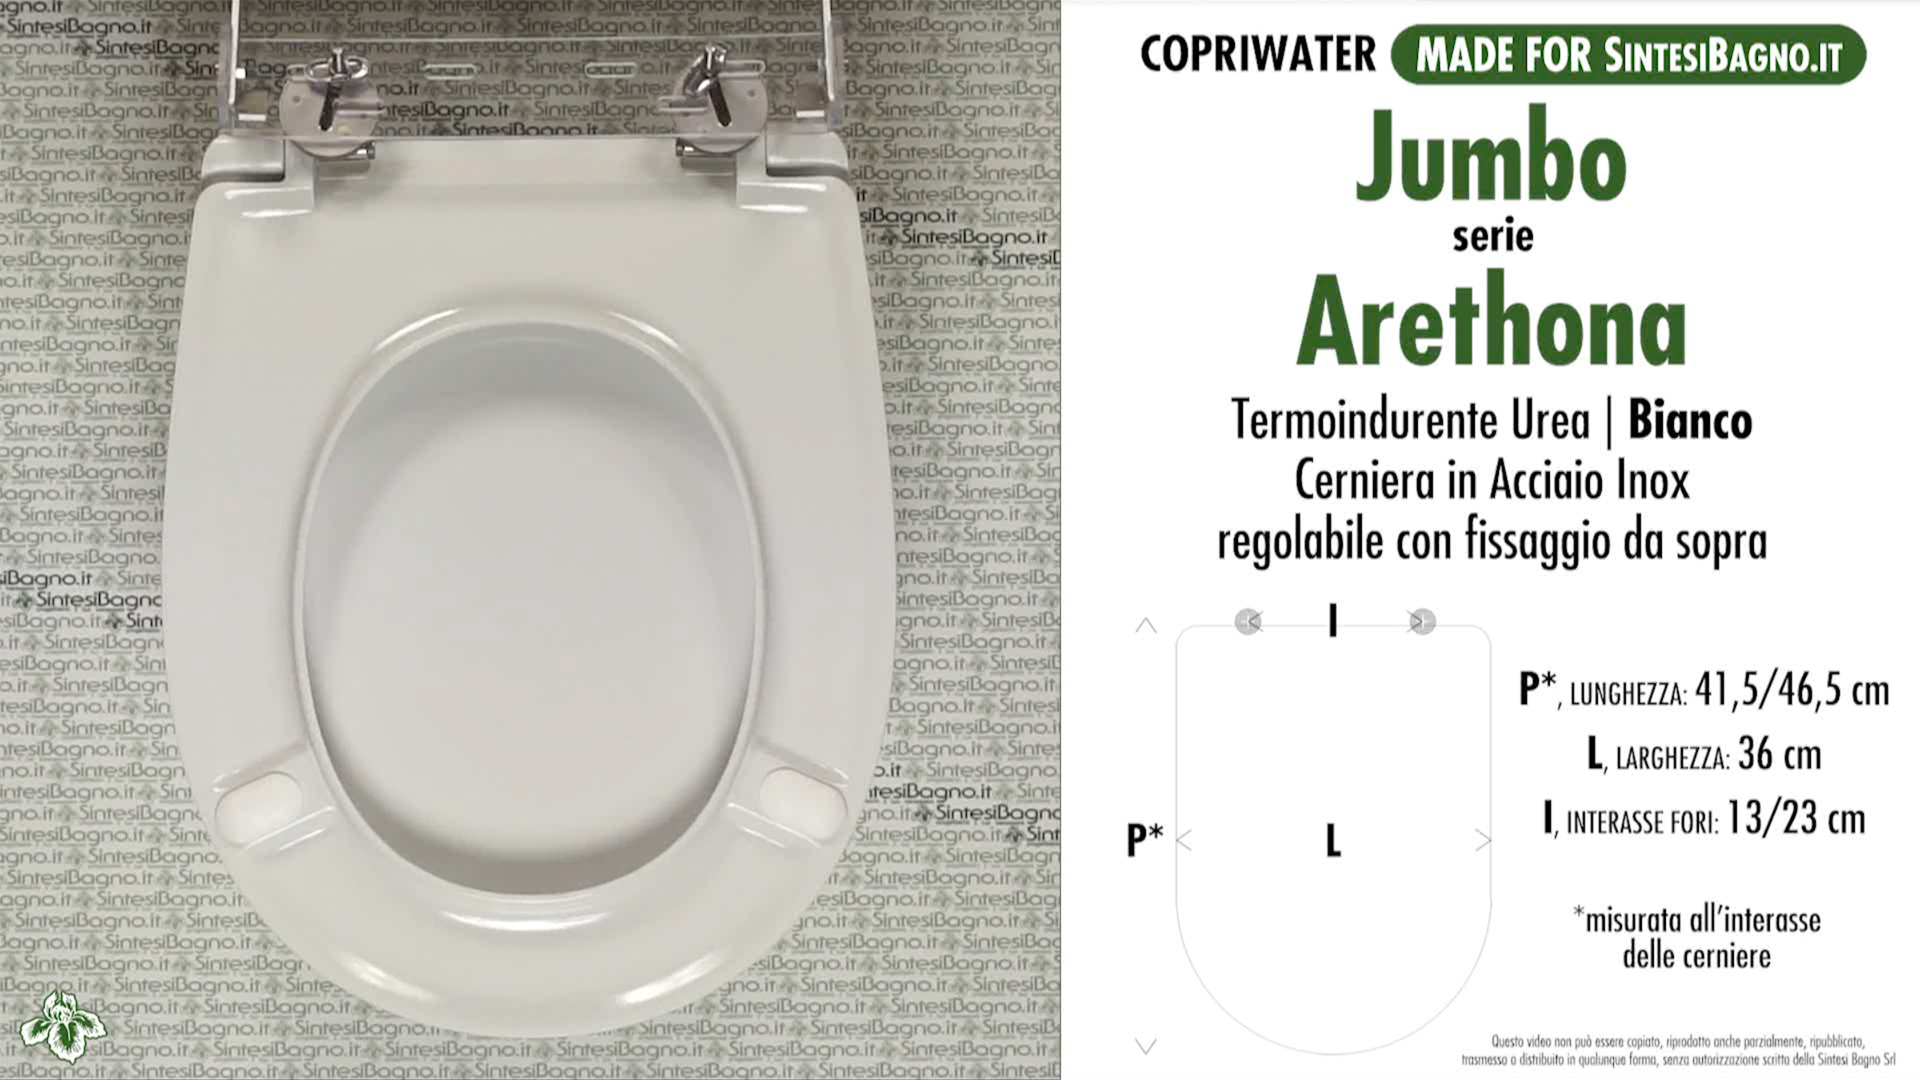 SCHEDA TECNICA MISURE copriwater JUMBO 2 ARETHONA